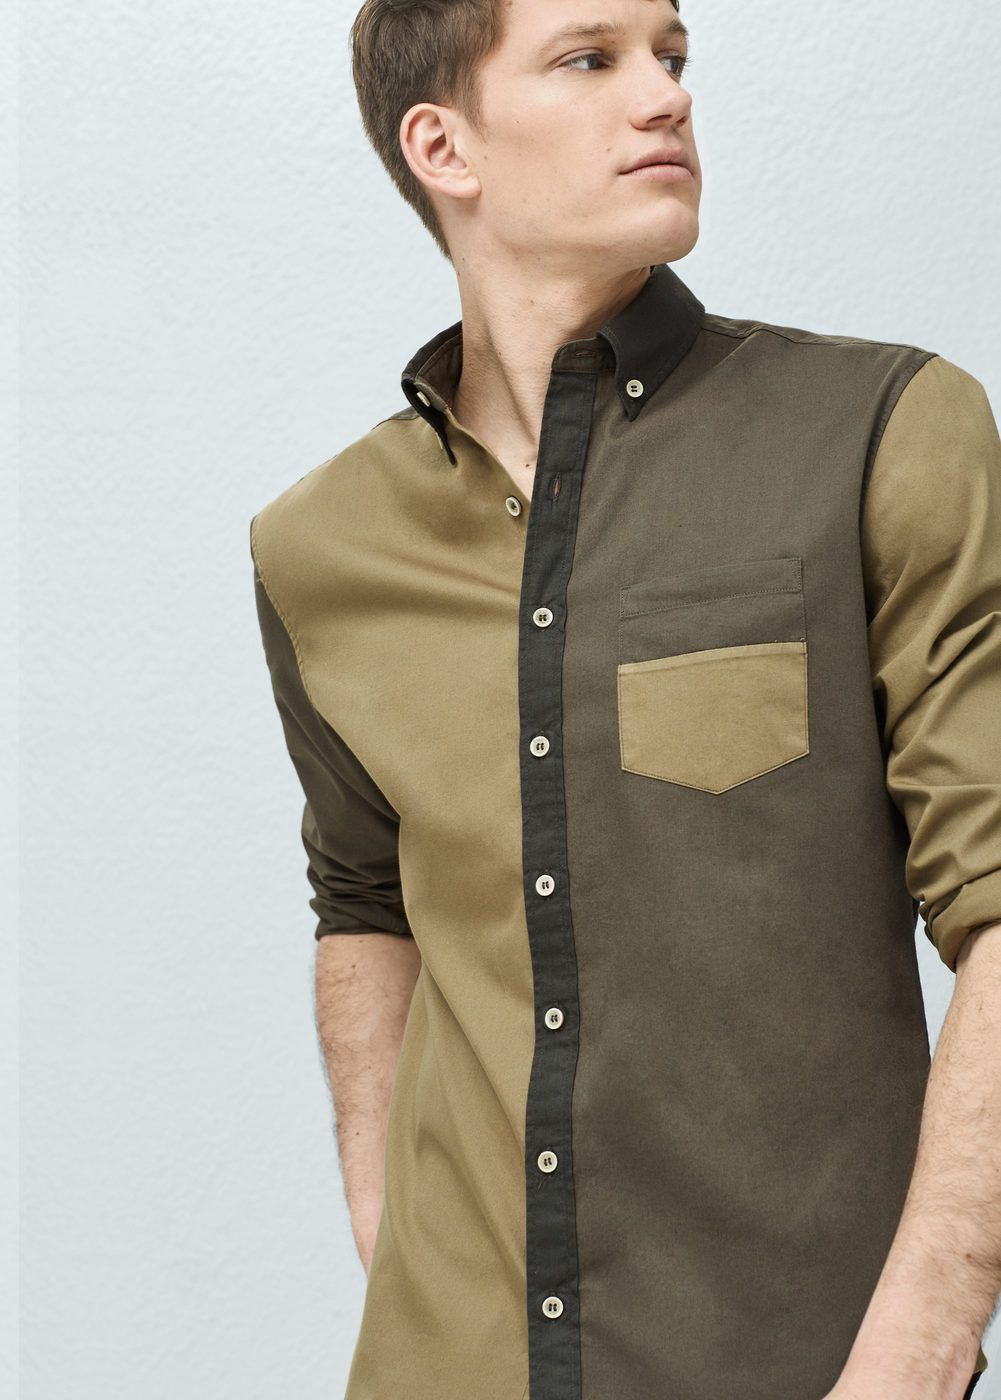 Slim Fit Color Block Shirt Men Mango Man Usa Camisa De Moda Camisas De Moda Hombre Ropa De Moda Hombre